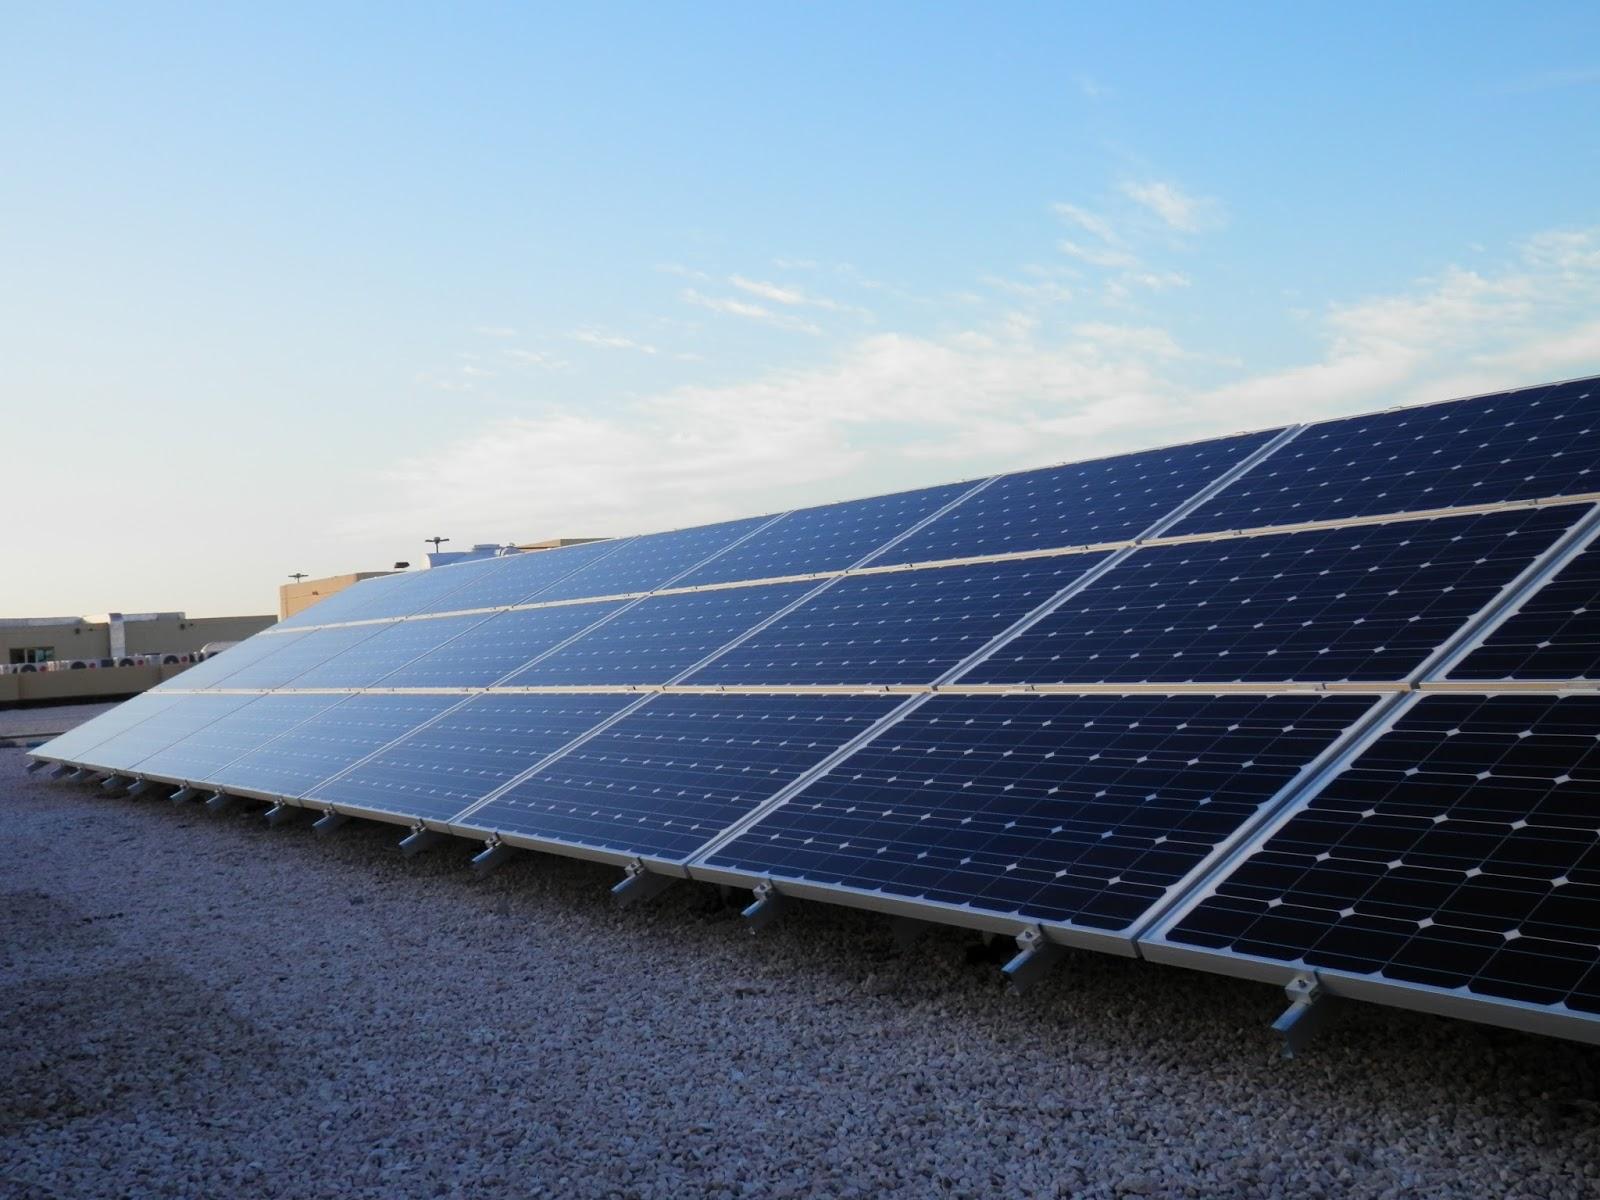 16 Tests aus Photovoltaik - Stiftung Warentest Photovoltaik rechner stiftung warentest